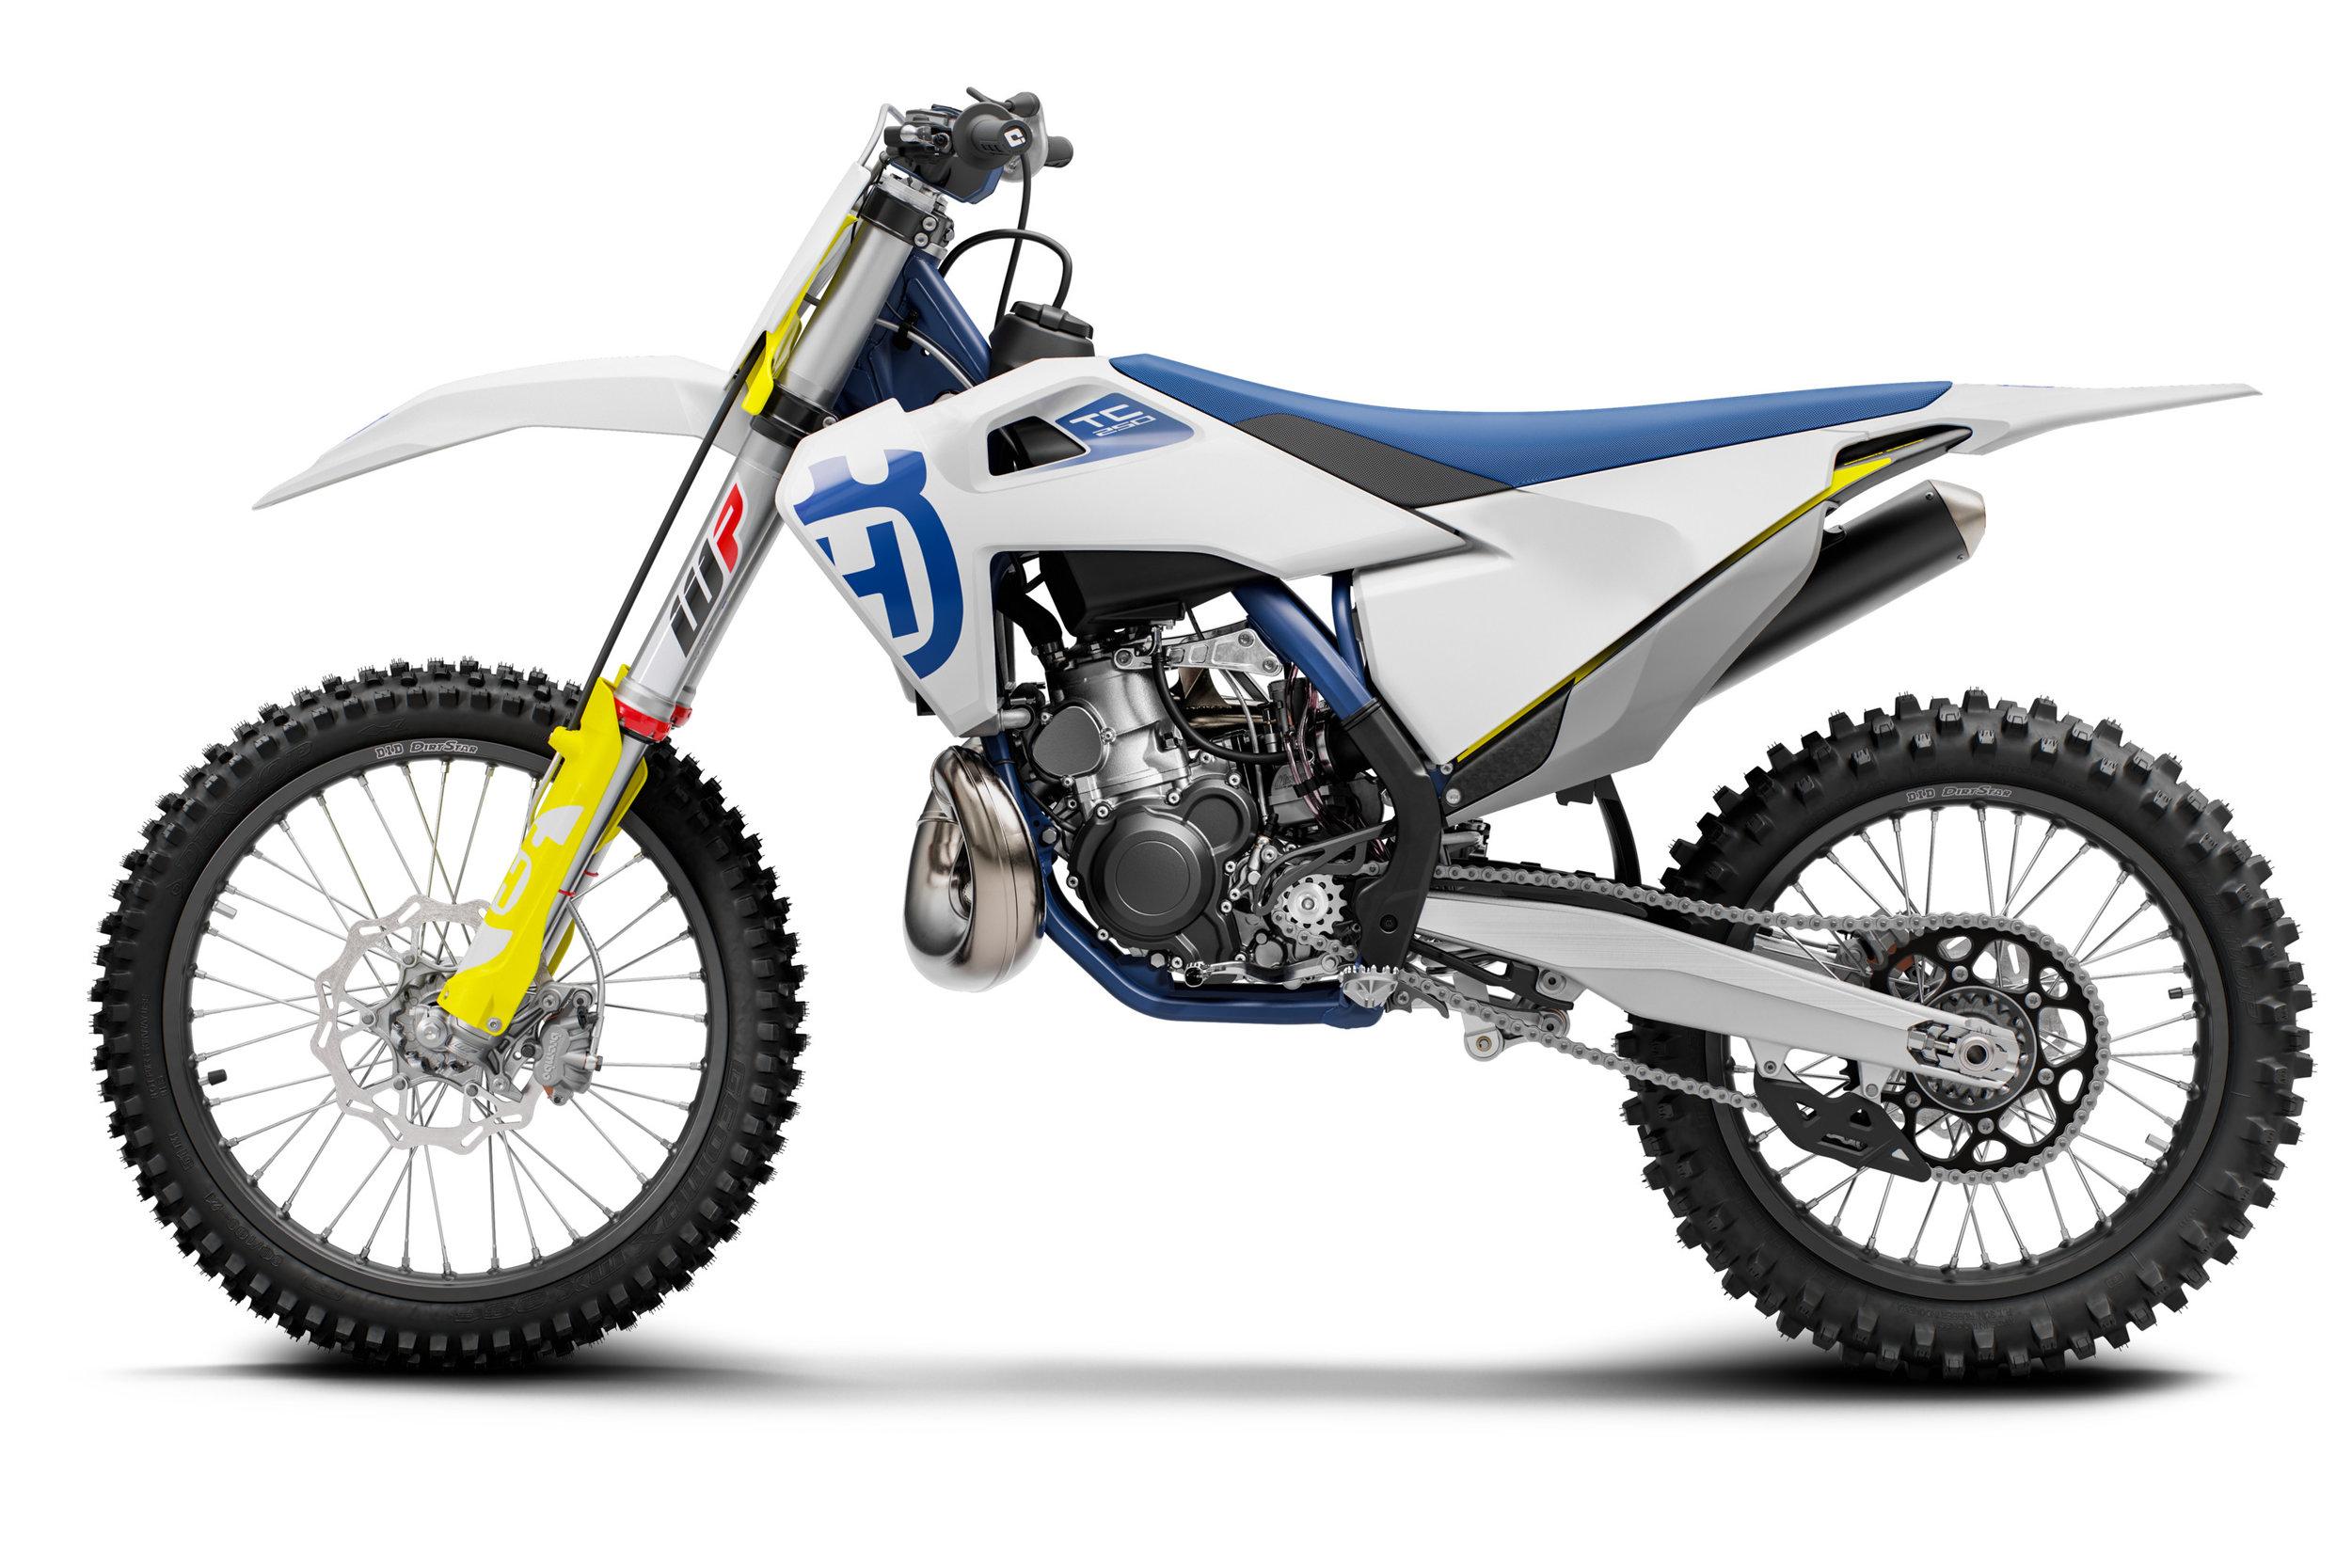 2020 TC250